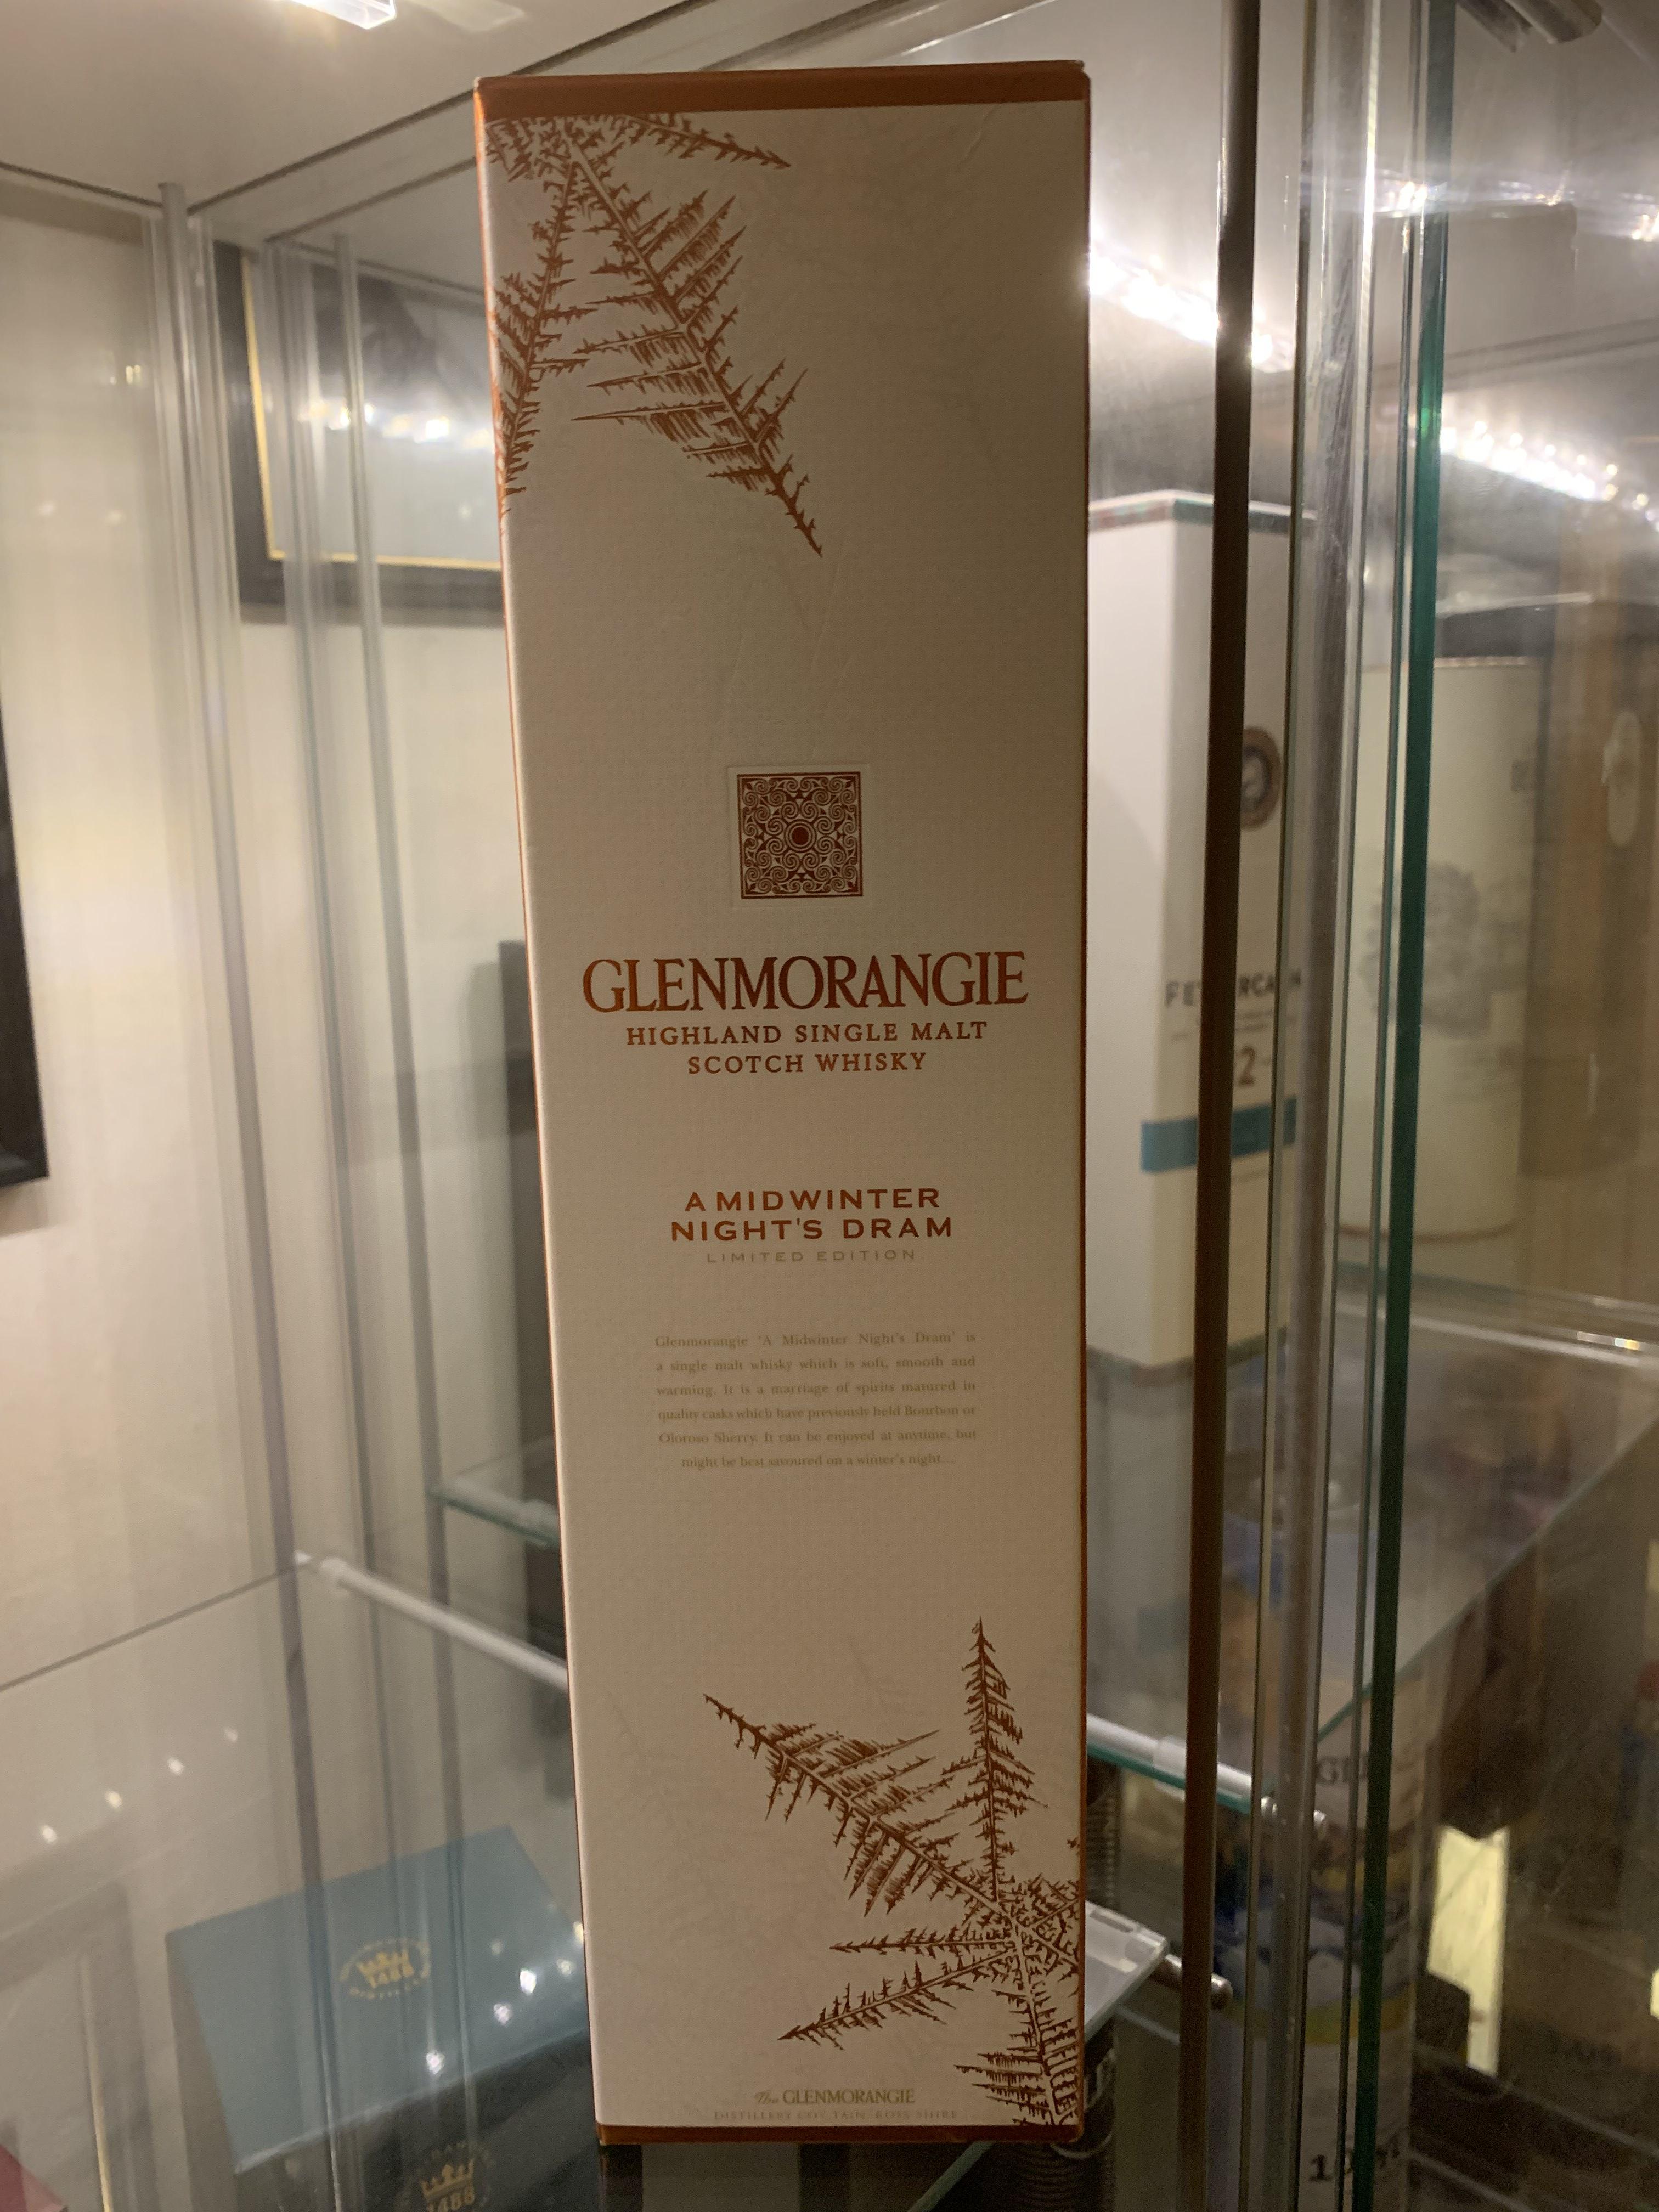 "Glenmorangie ""A midwinter night's dram"" 2015 £34 instore @ Day today"